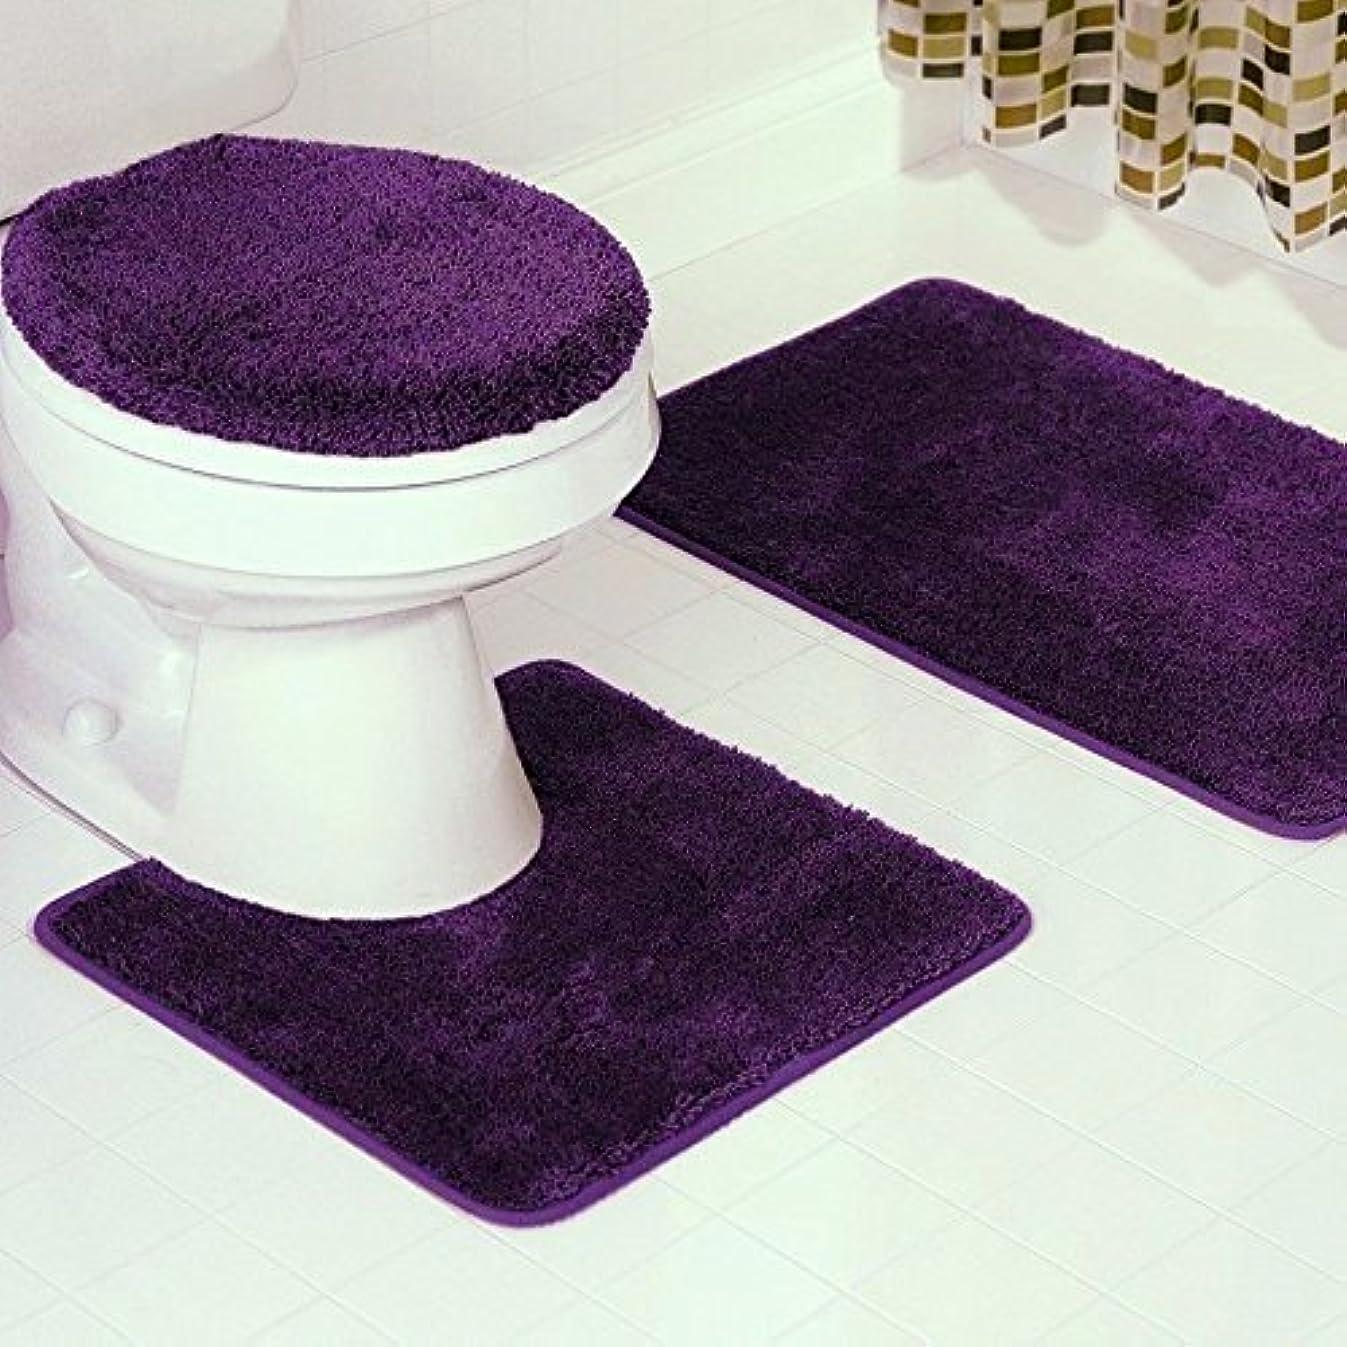 Fancy Linen 3pc Dark Purple Non-Slip Bath Mat Set Bathroom U-Shaped Contour Rug, Mat and Toilet Lid Cover New